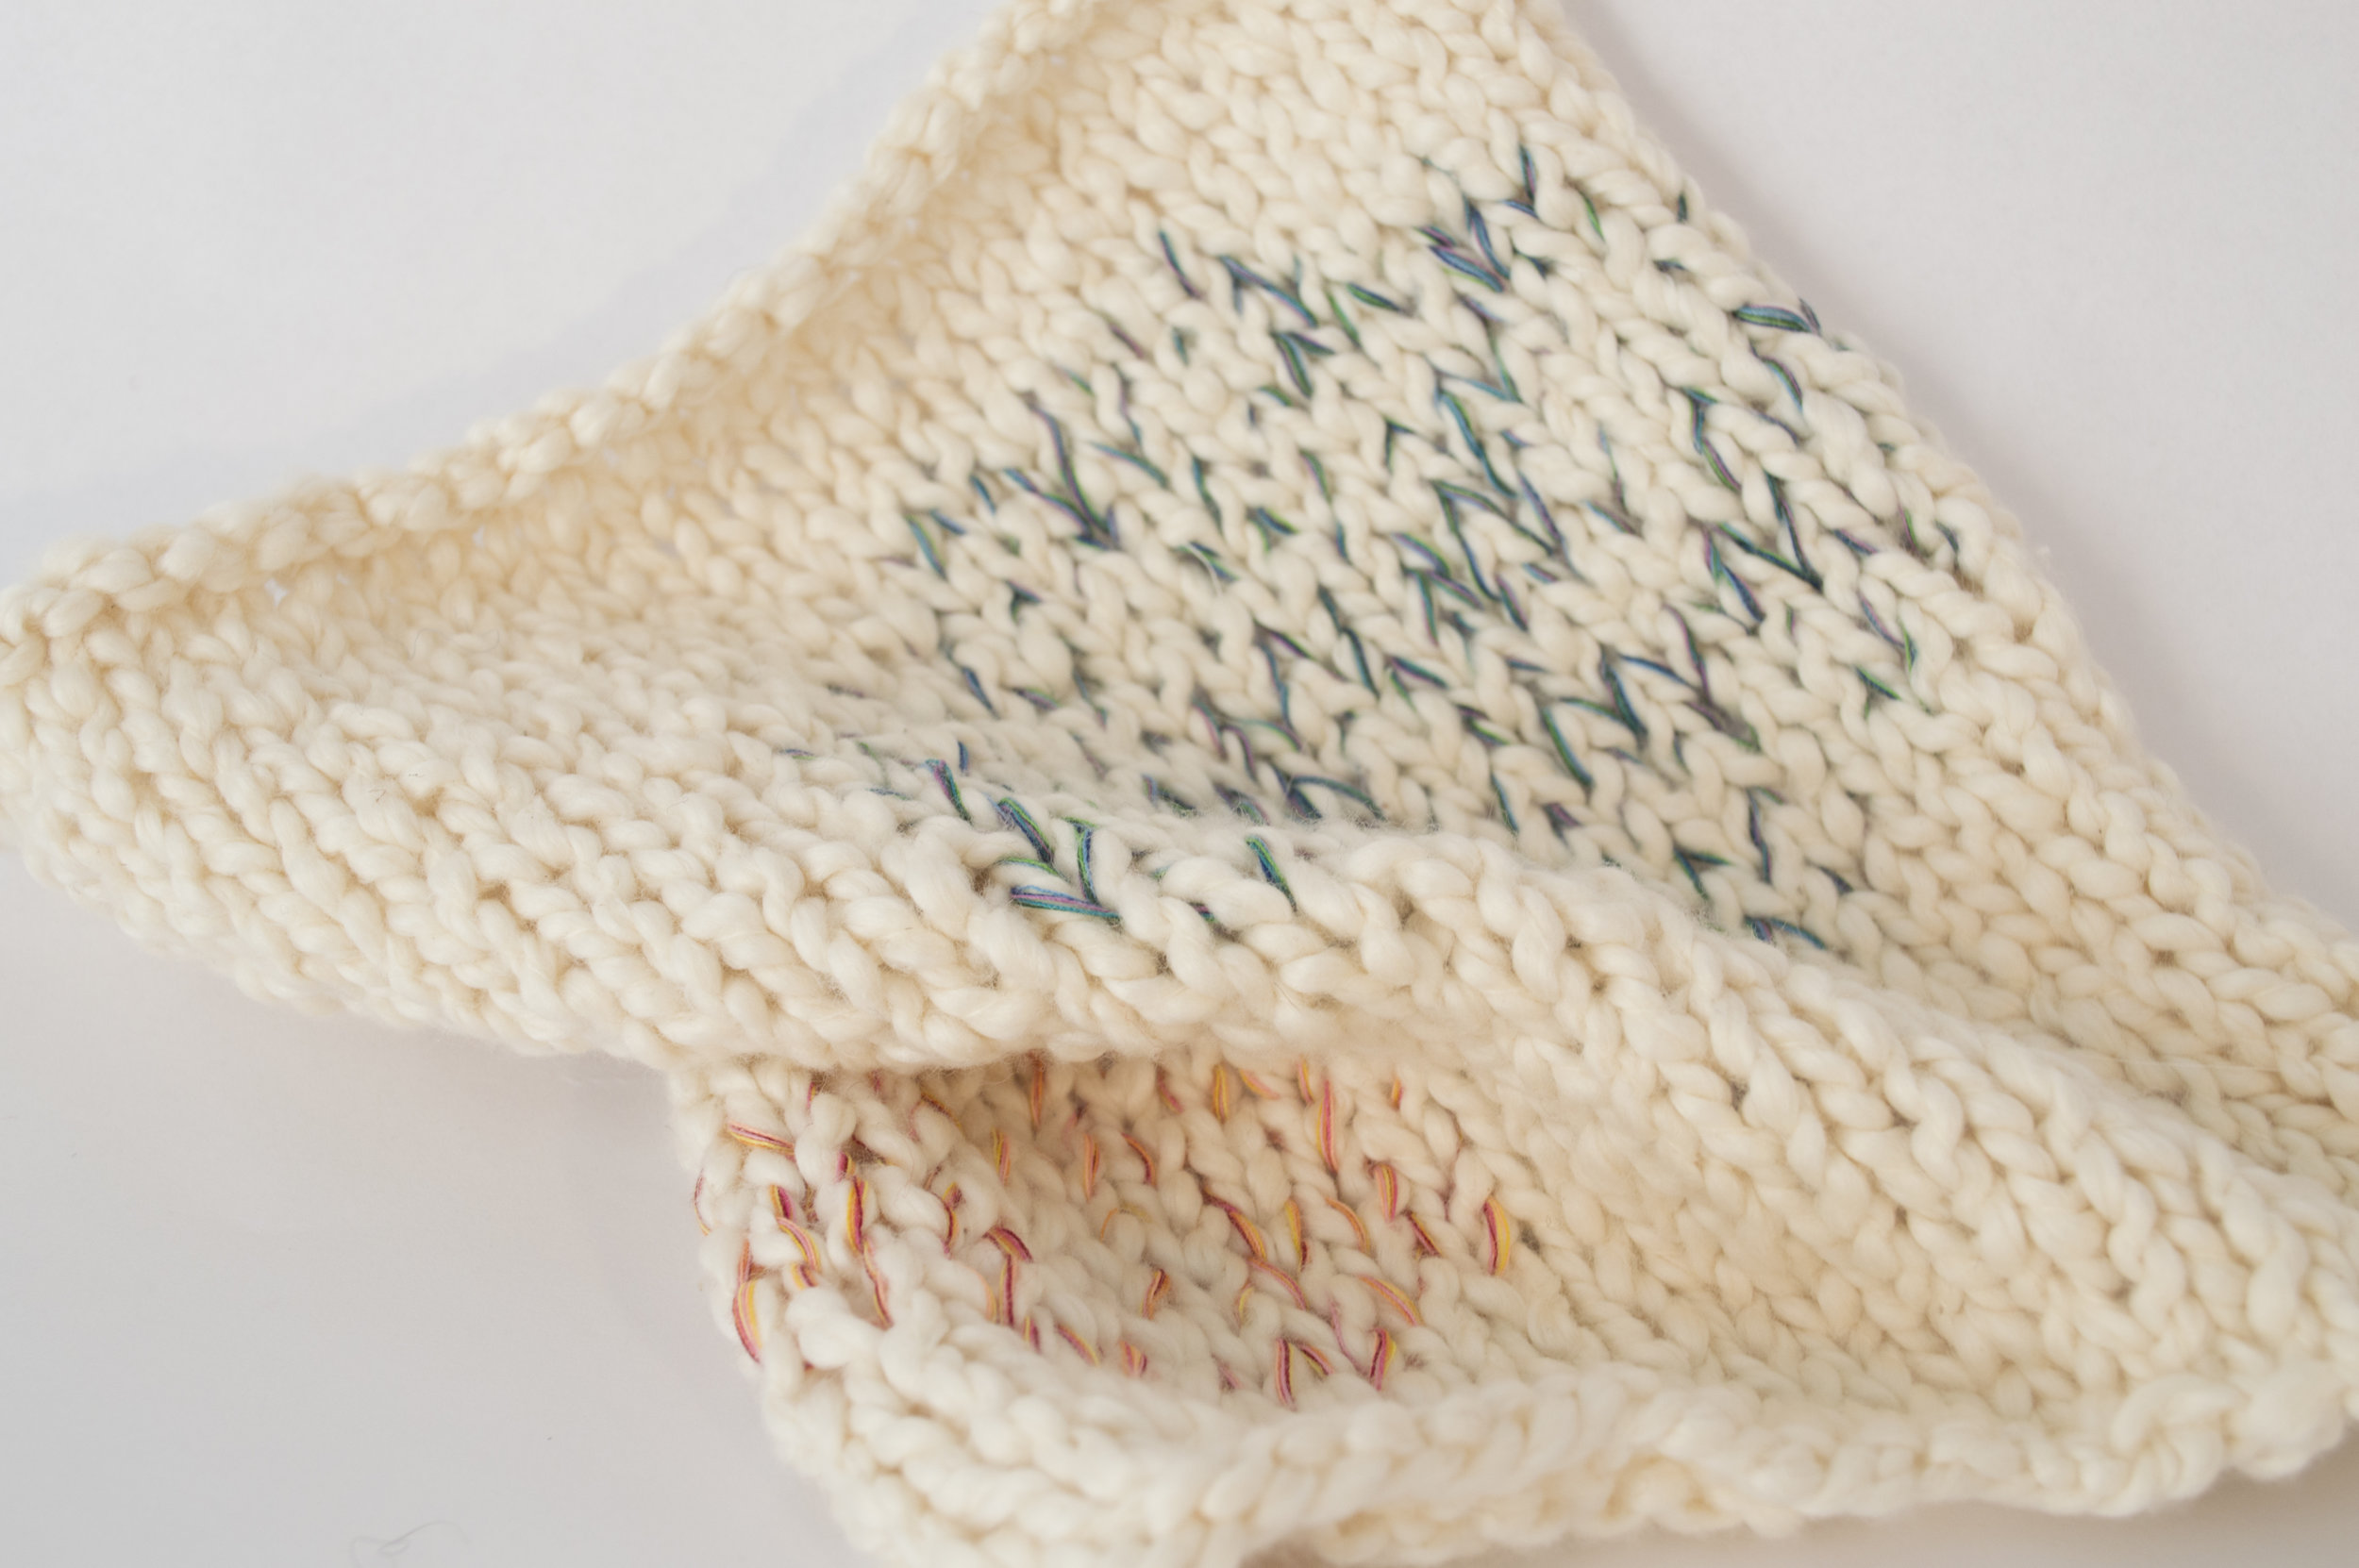 Textile design #2 knitting